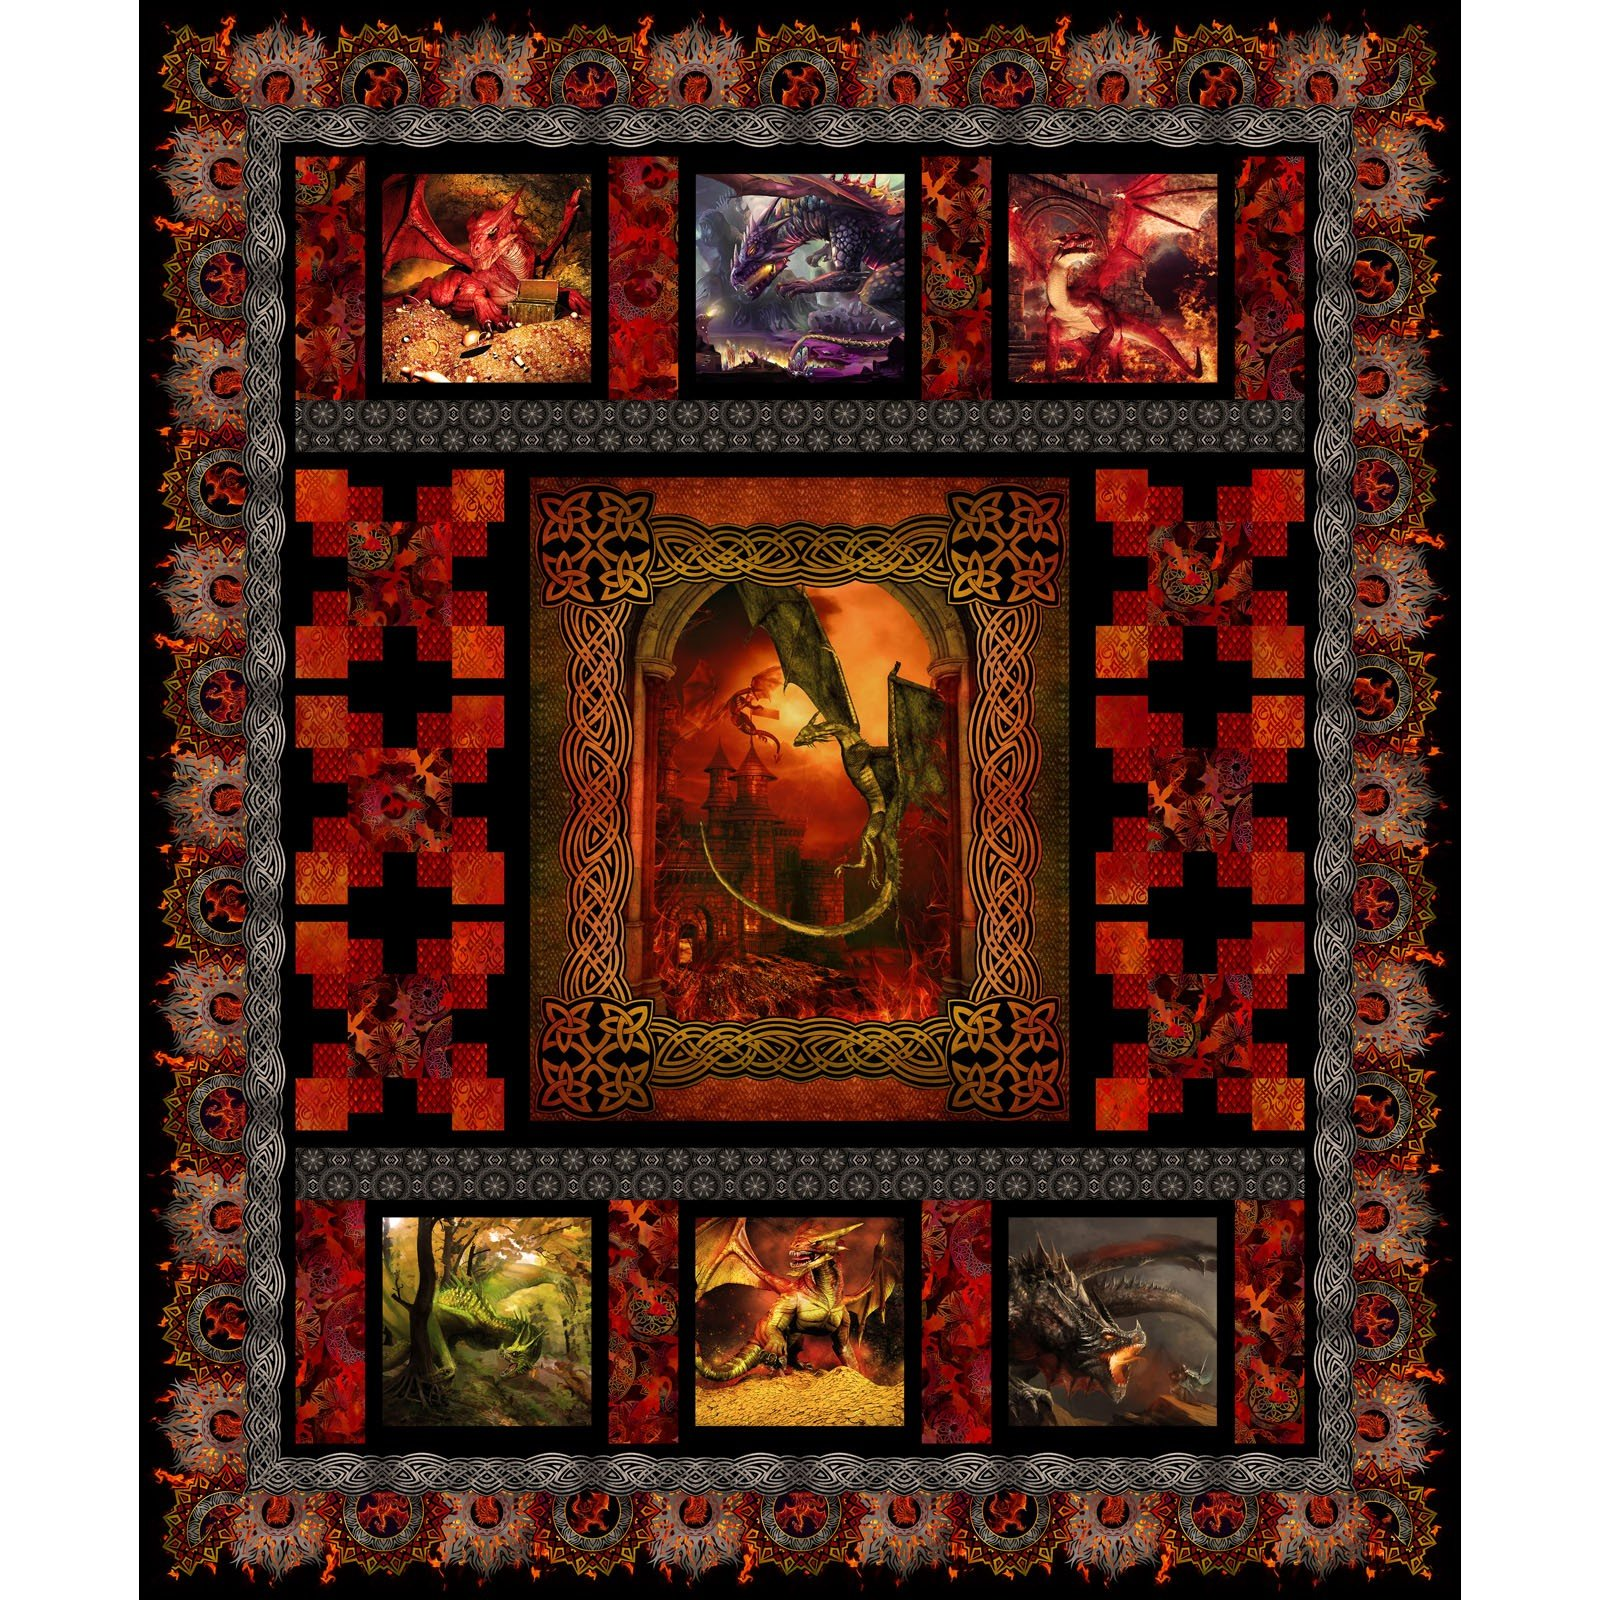 Red Dragon Quilt Kit Jason Yenter In The Beginning Fabrics